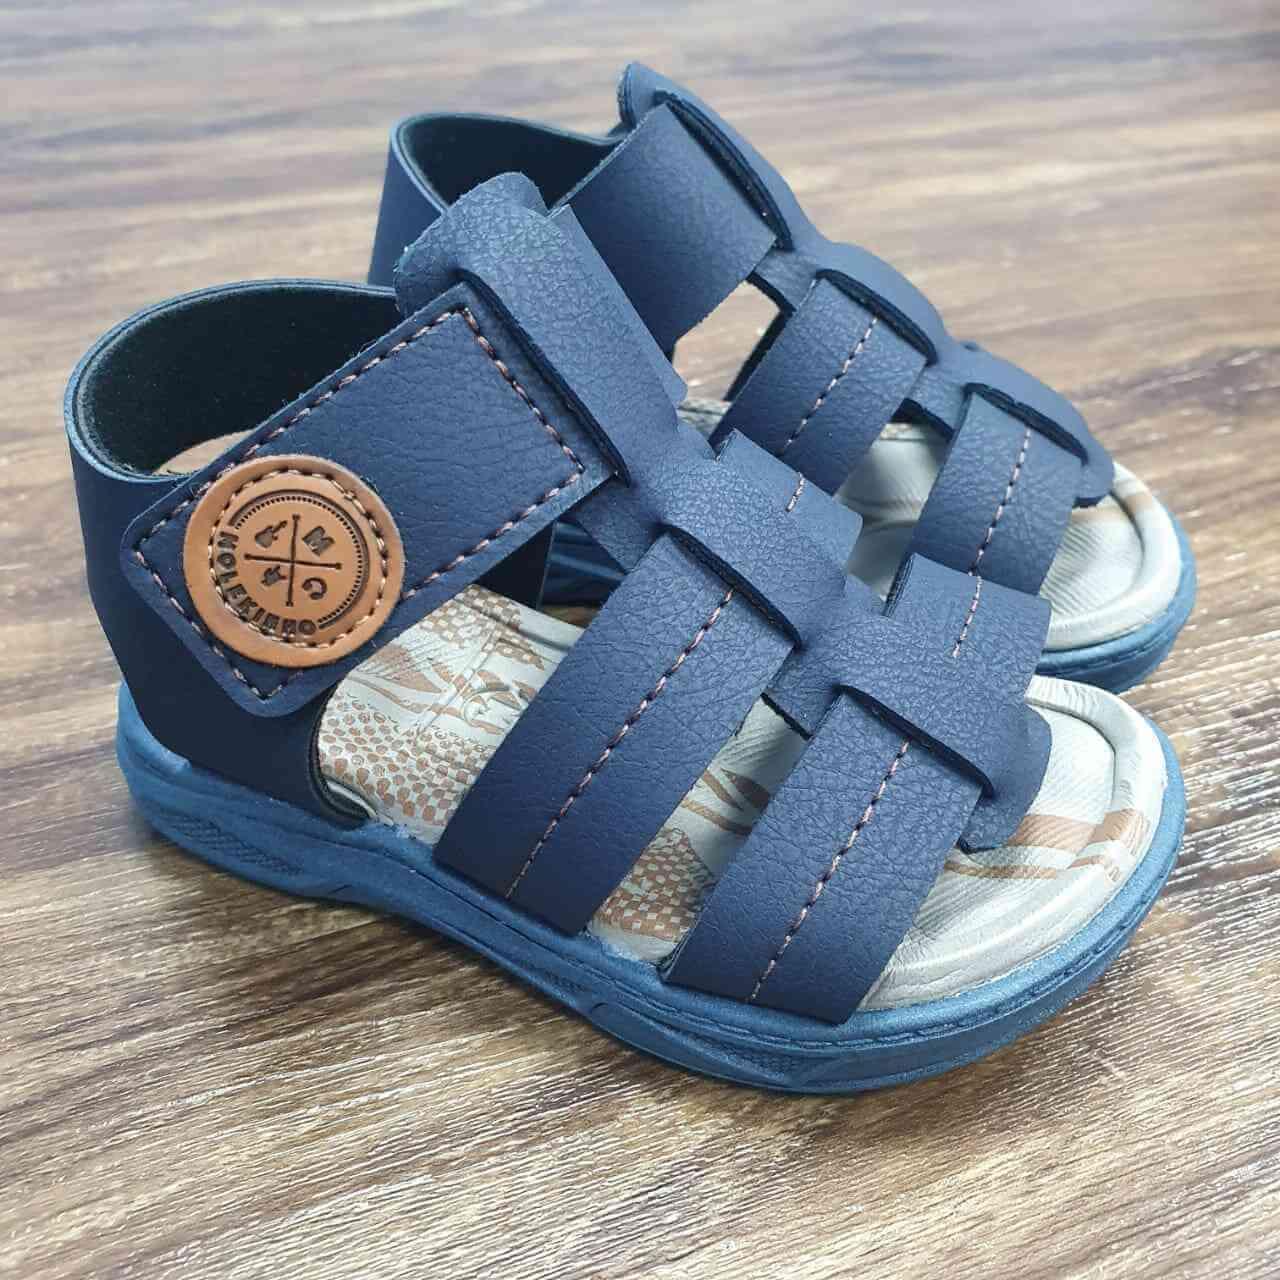 Sandalia Azul Marinho Infantil